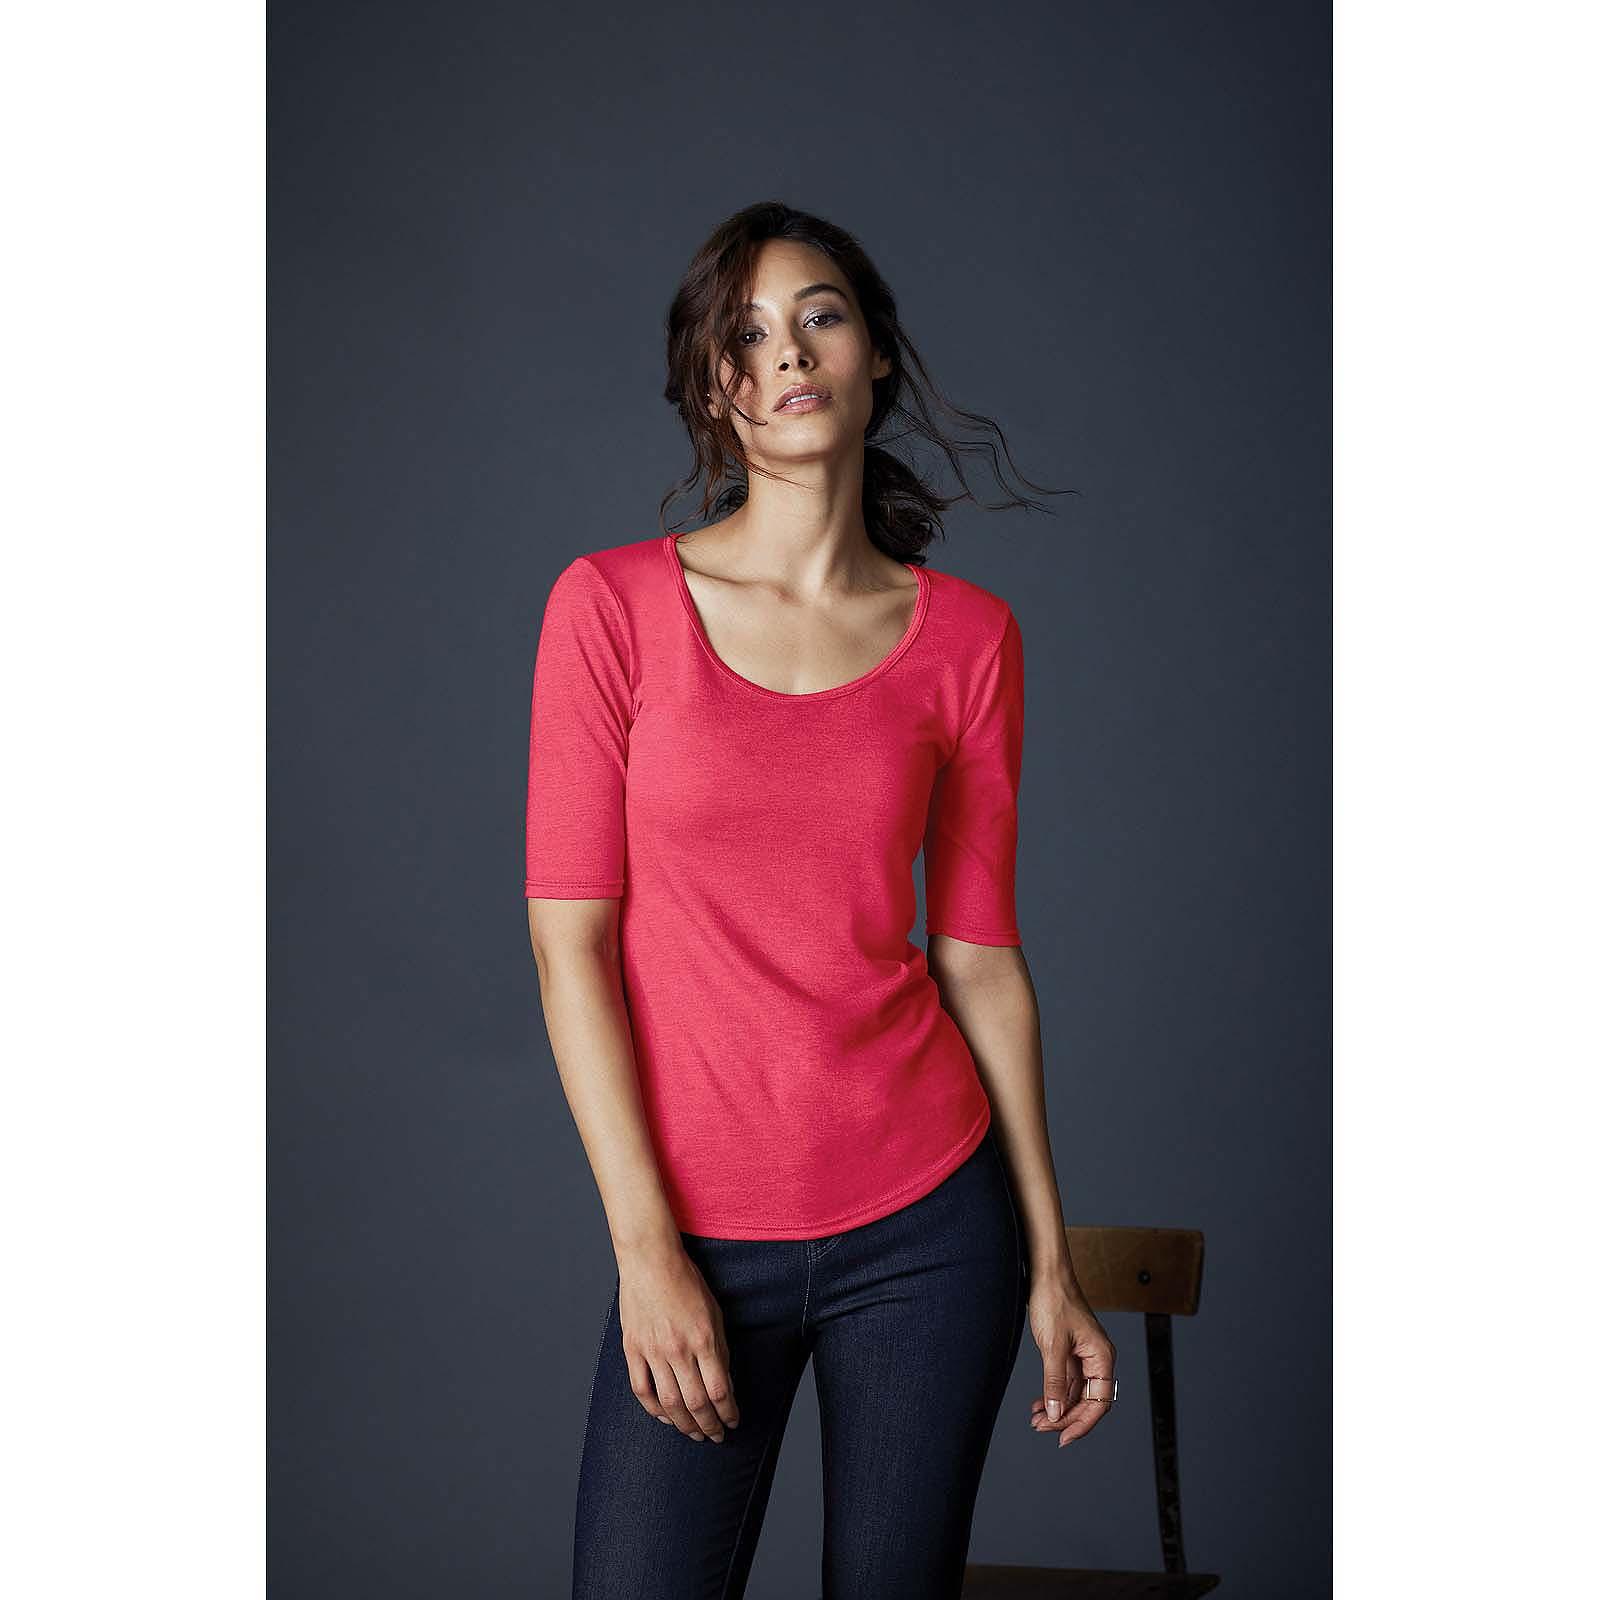 9d1e7be000ca Details about Ladies Tri Blend Deep Scoop Neck 1/2 Half Sleeve T Shirt  Women Fit Plain Tee Top